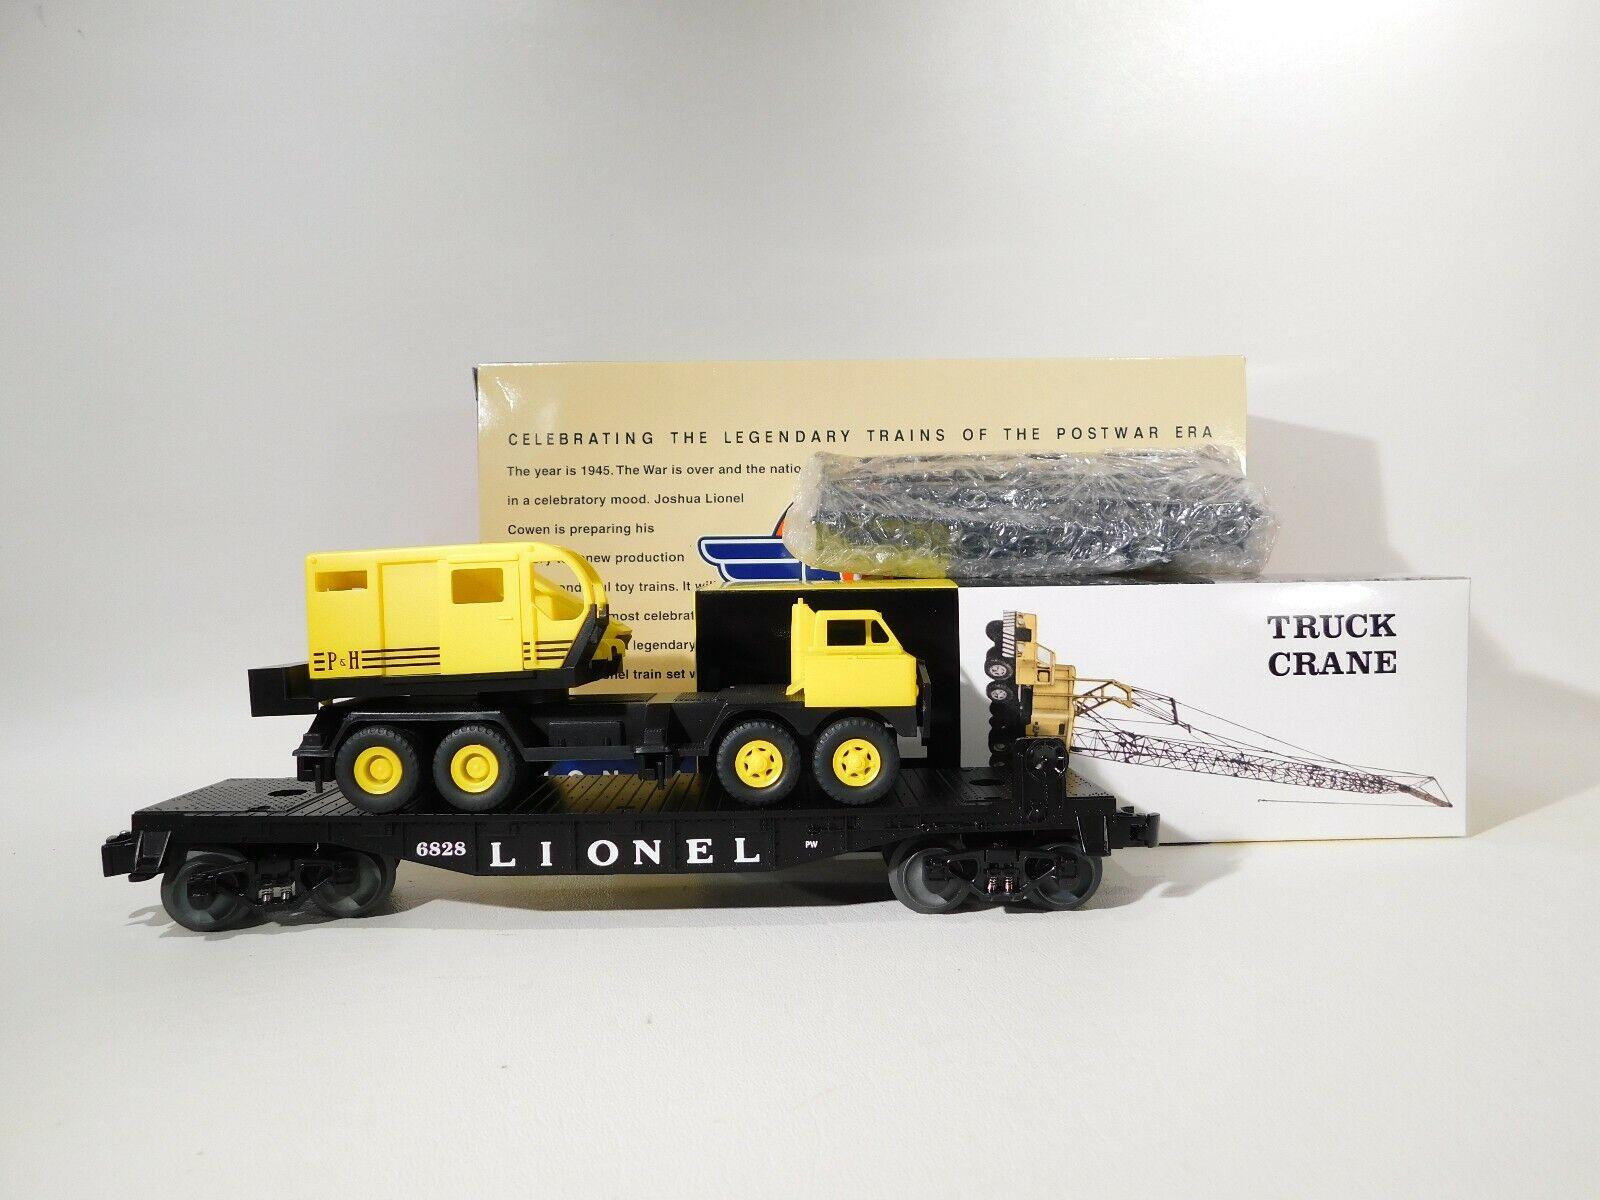 Lionel O Gauge 6828 autoro con harnischfeger costruzione 629486 C 129  TOTES 1